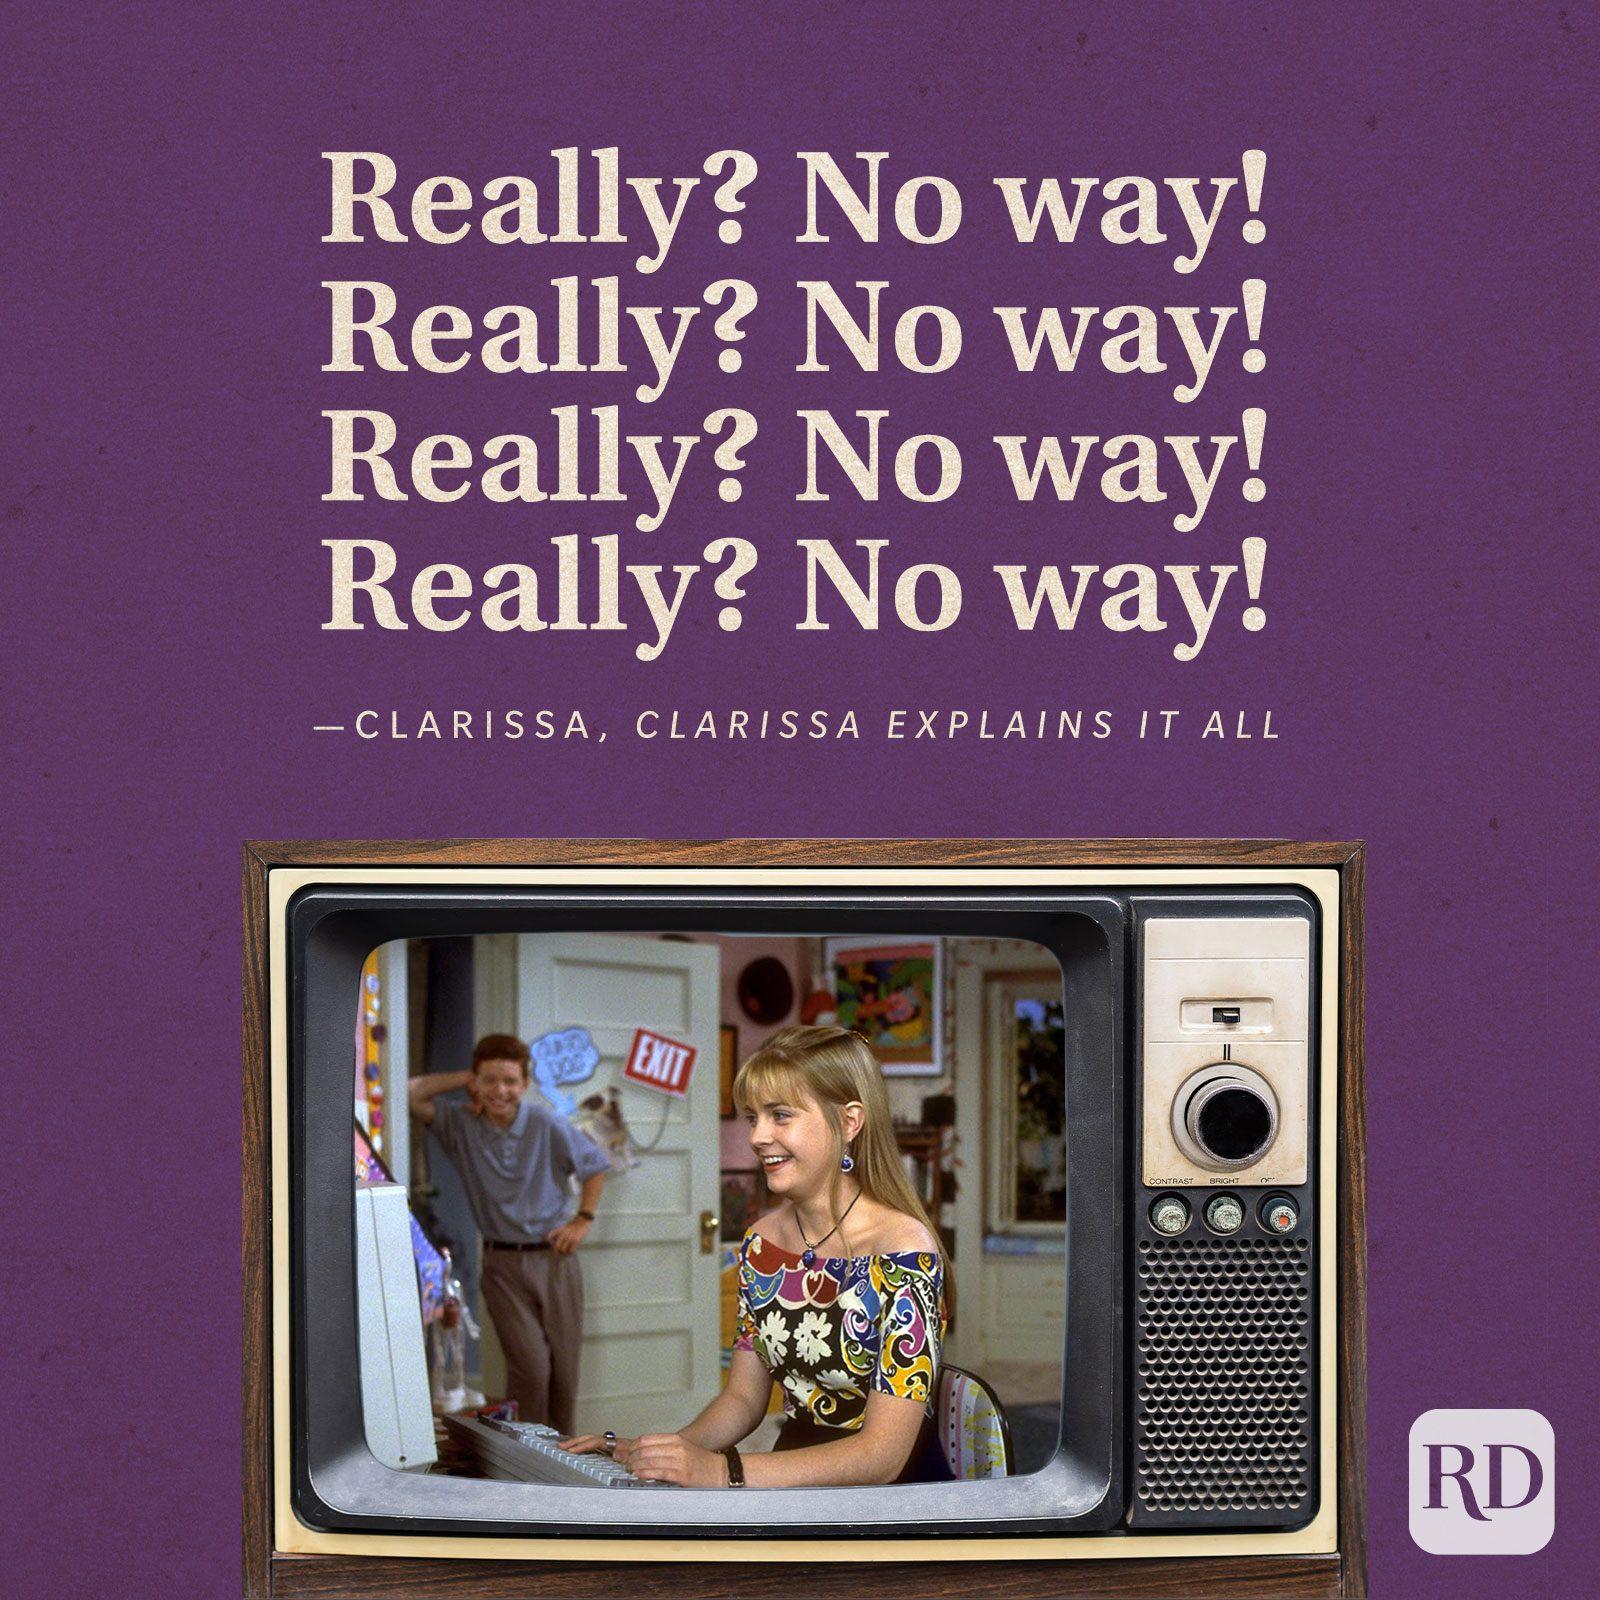 """Really? No way! Really? No way! Really? No way! Really? No way!"" —Clarissa in Clarissa Explains it All."